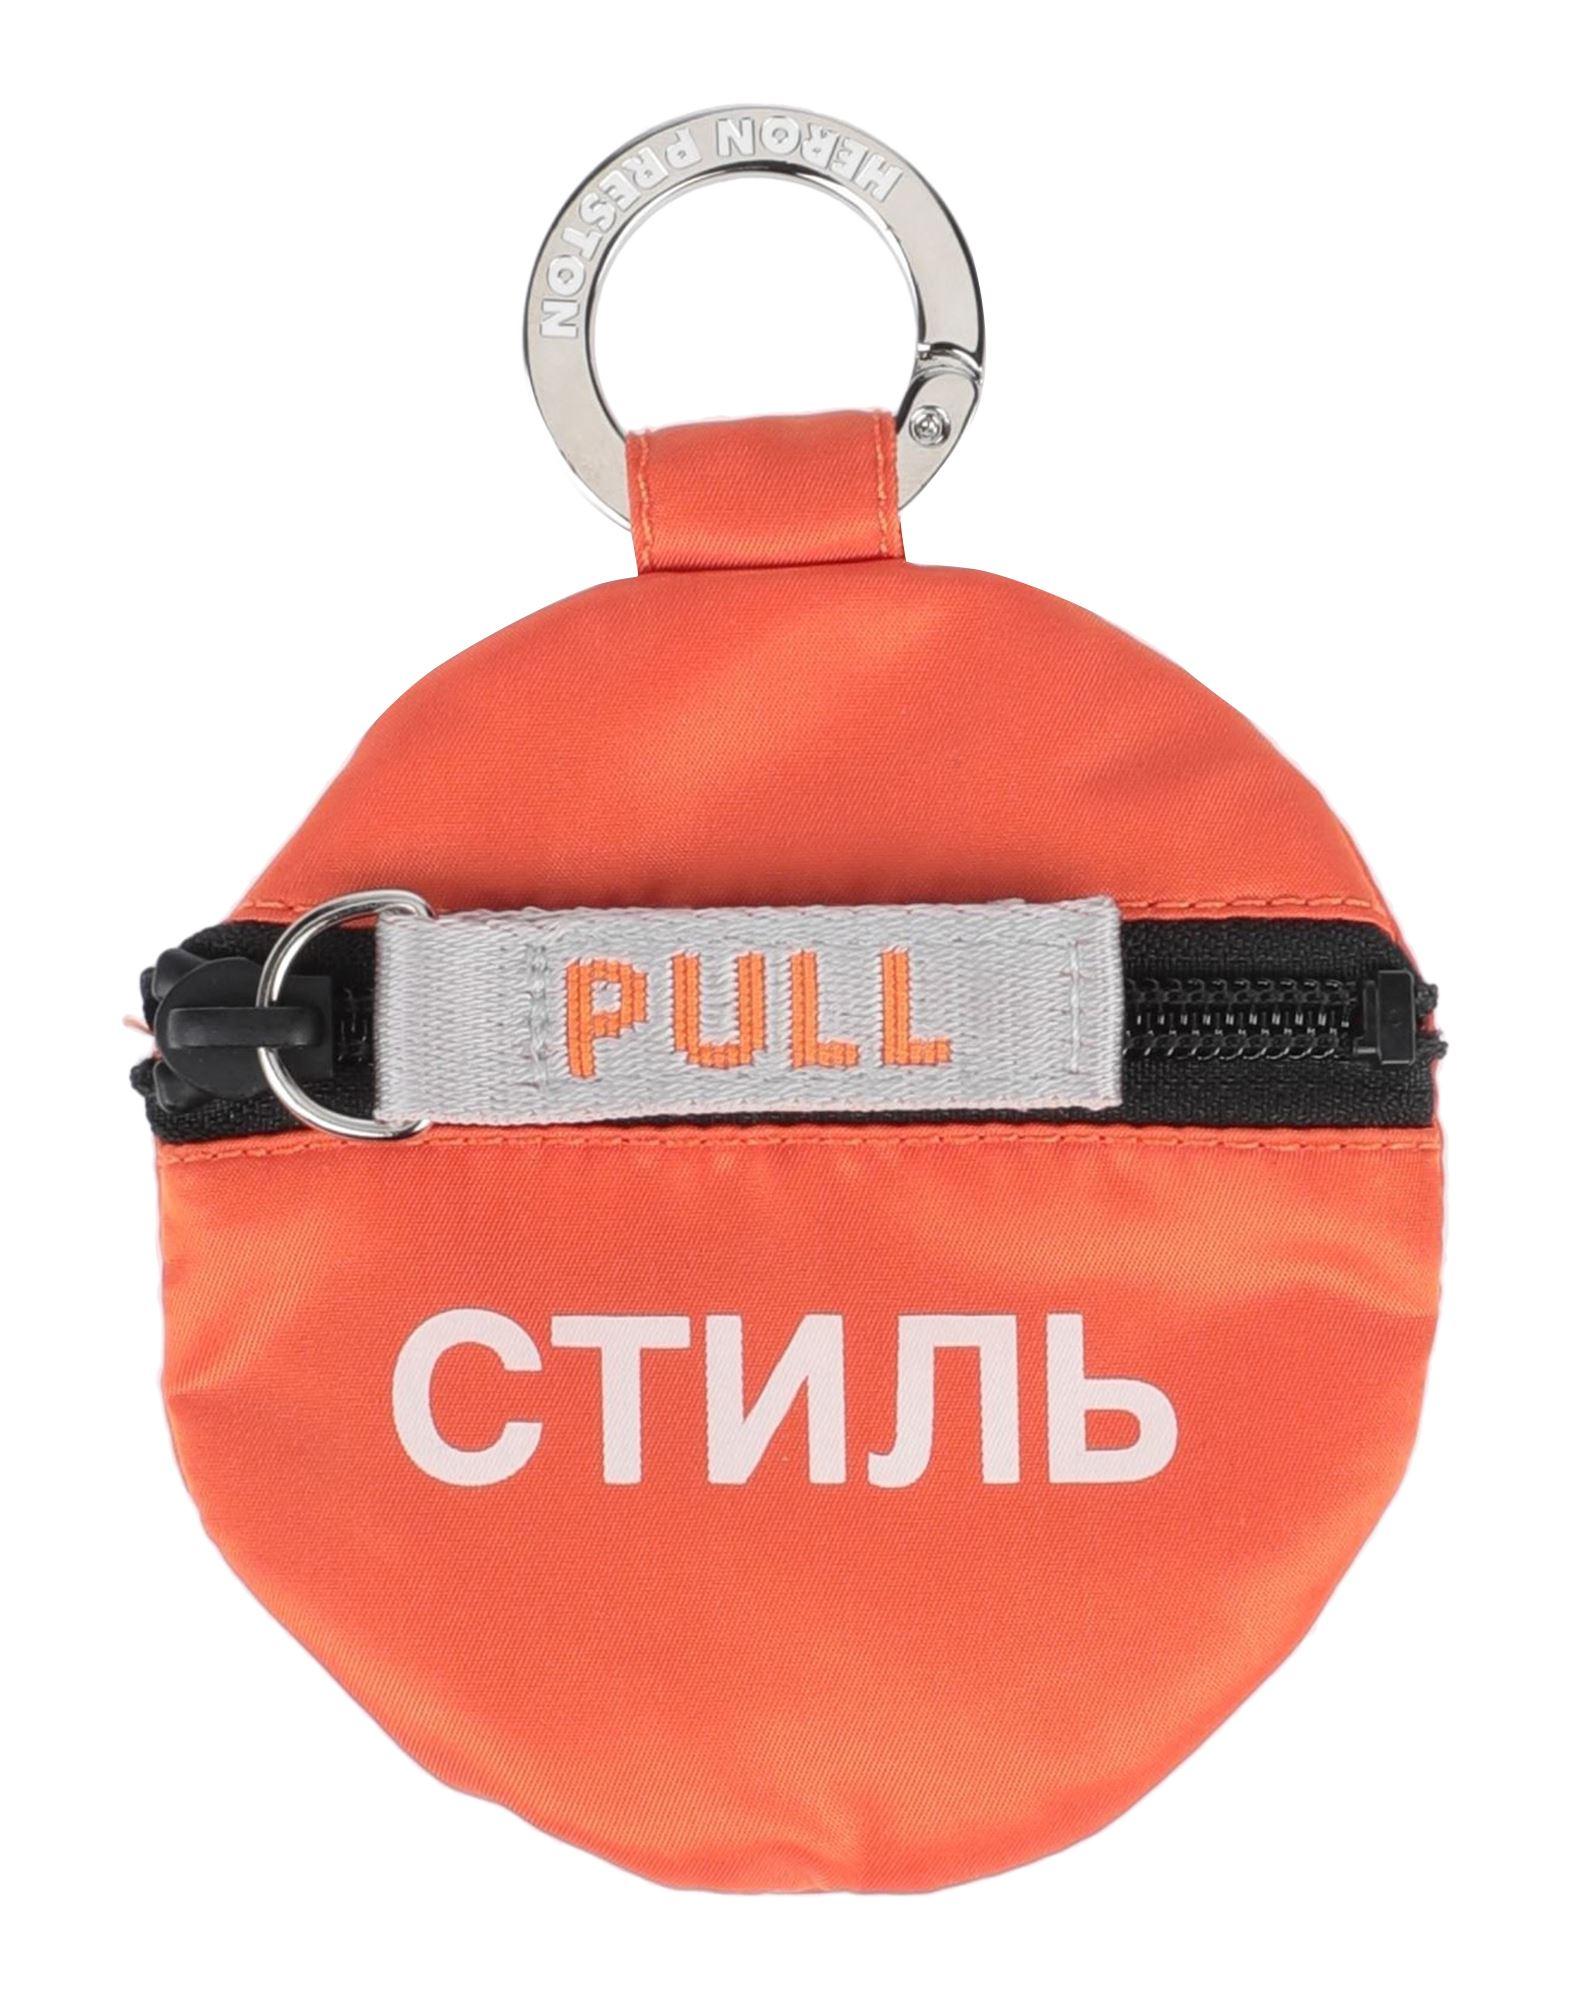 HERON PRESTON Coin purses. techno fabric, metal applications, logo, solid color, zipper closure. 54% Polyester, 46% Polyamide